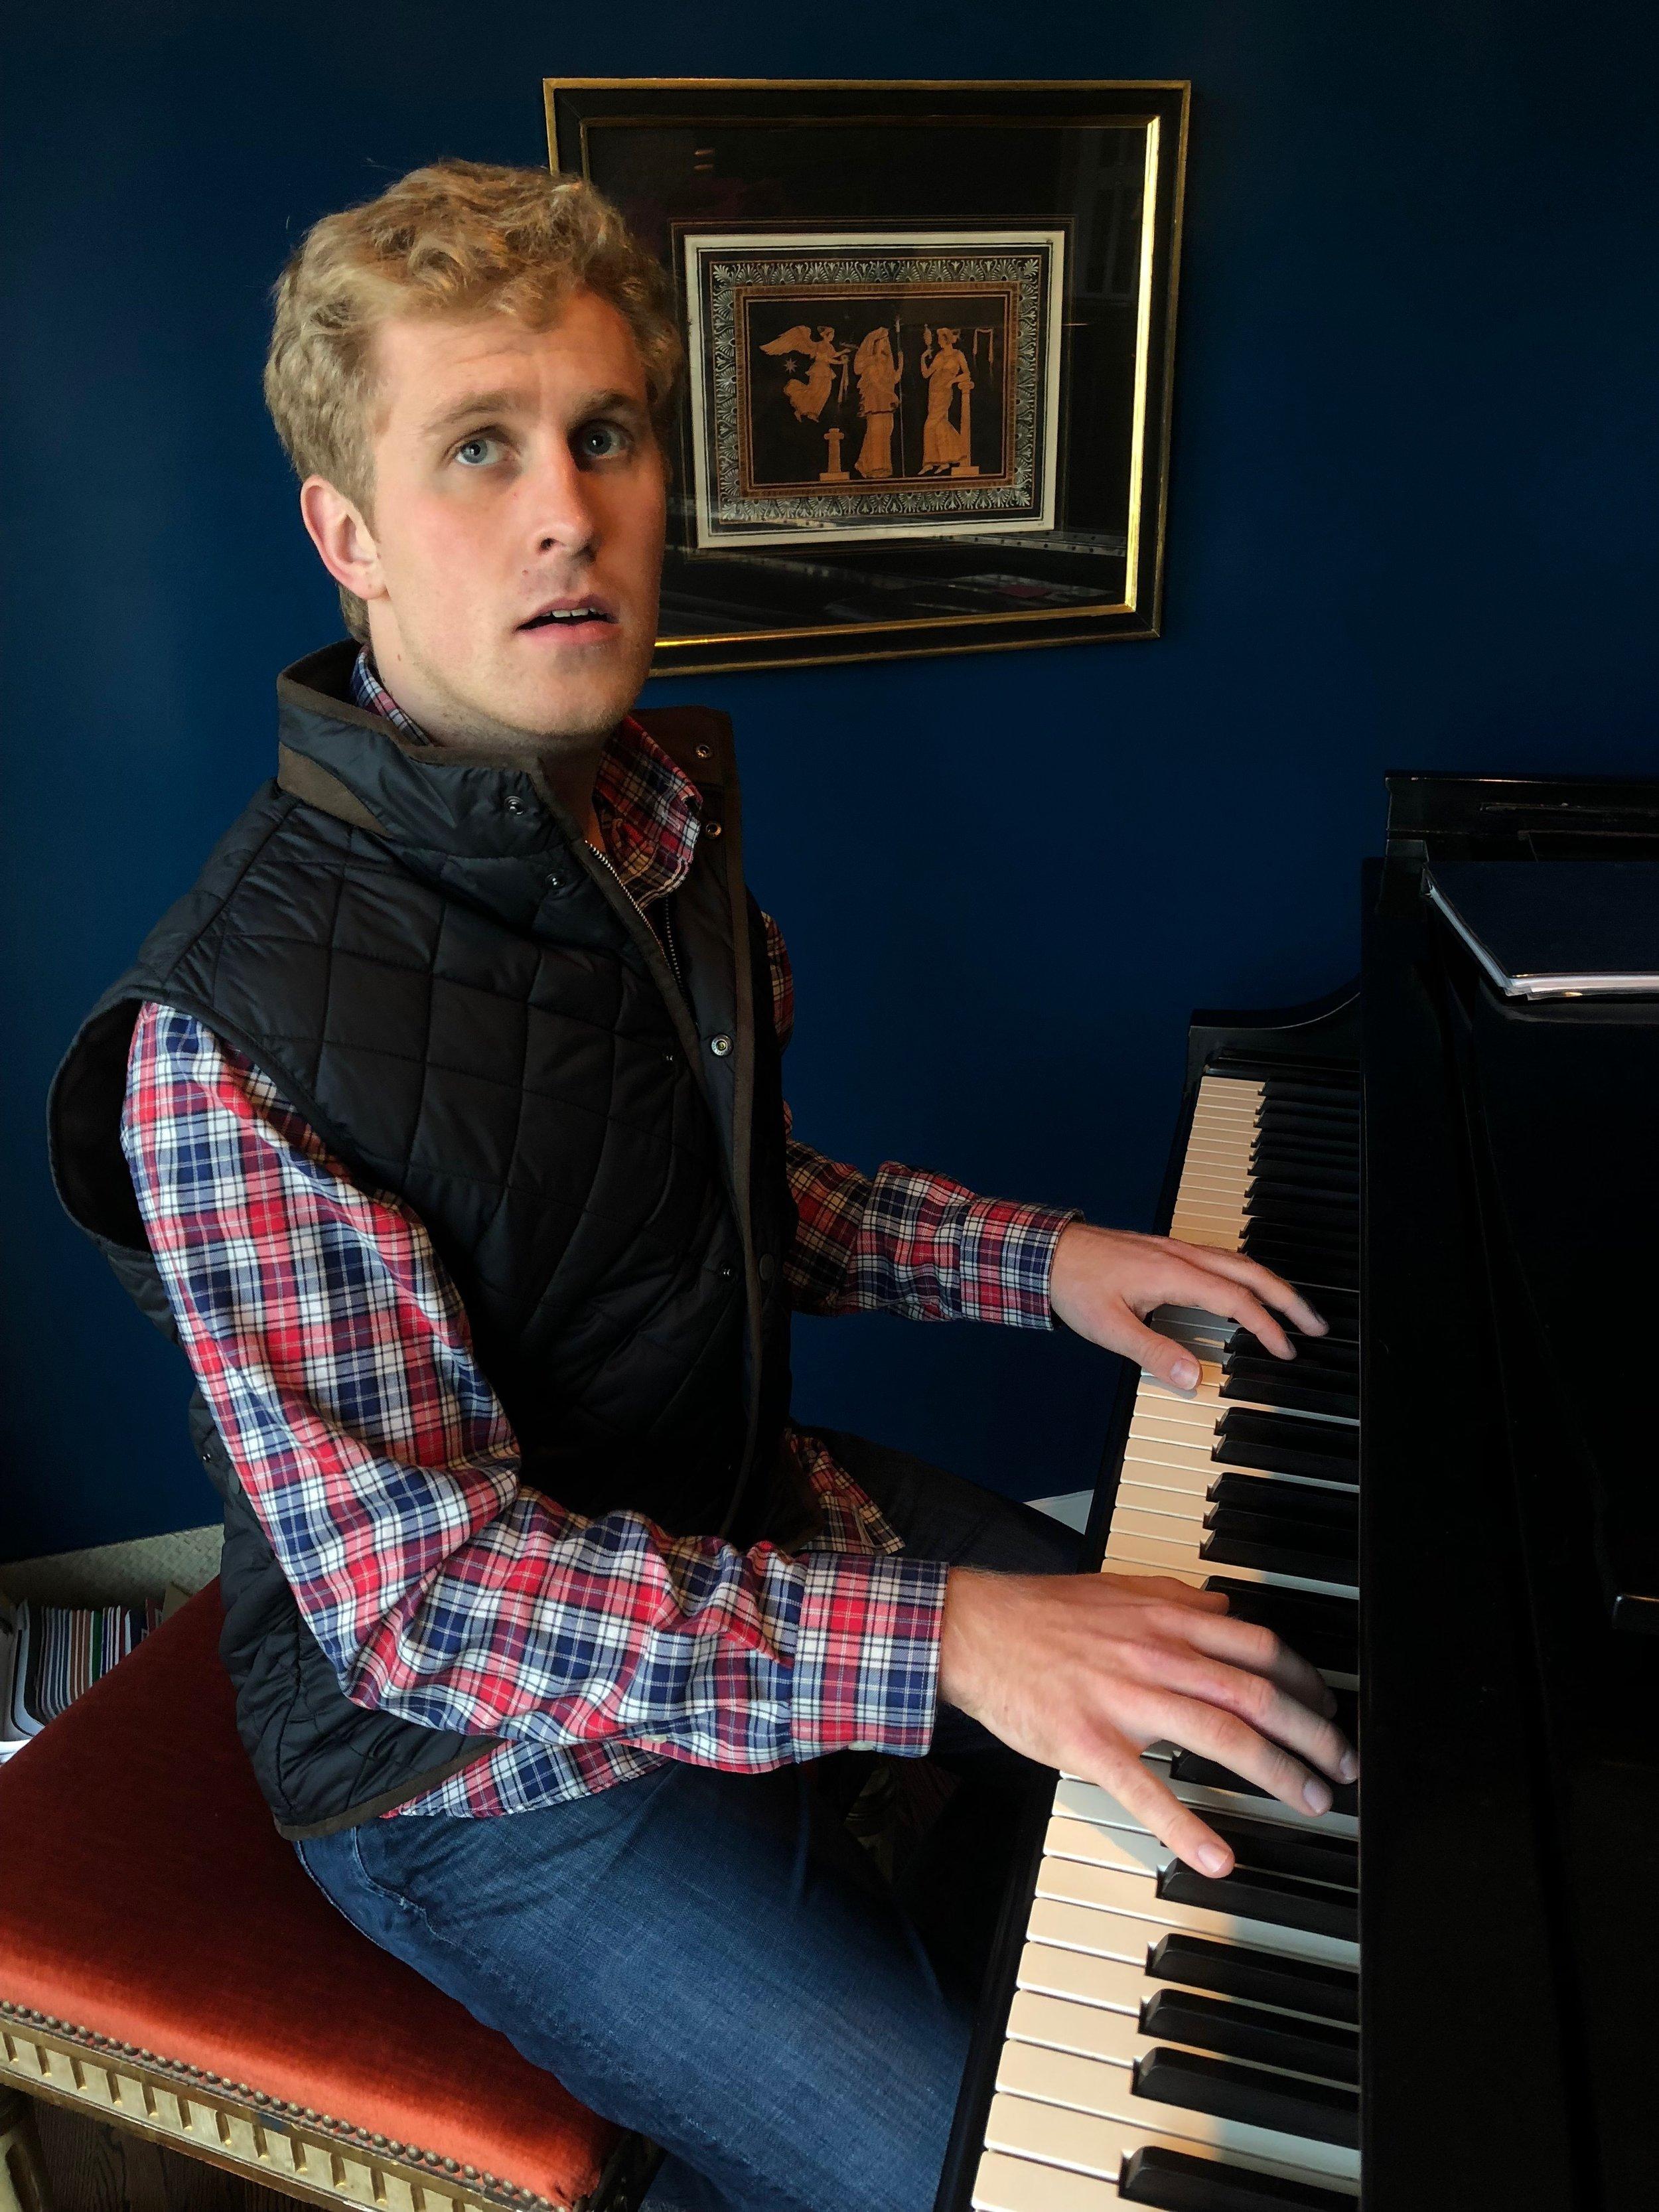 max-mccali-music-maxmccali-musician-guitarist-pianist-piano-recordingartist-singersongwriter-singer-songwriter-countrymusic-popmusic-edm-dancemusic-tropicalhouse-newmusic-recordingstudio-beach-playingpiano-style-passion.JPG